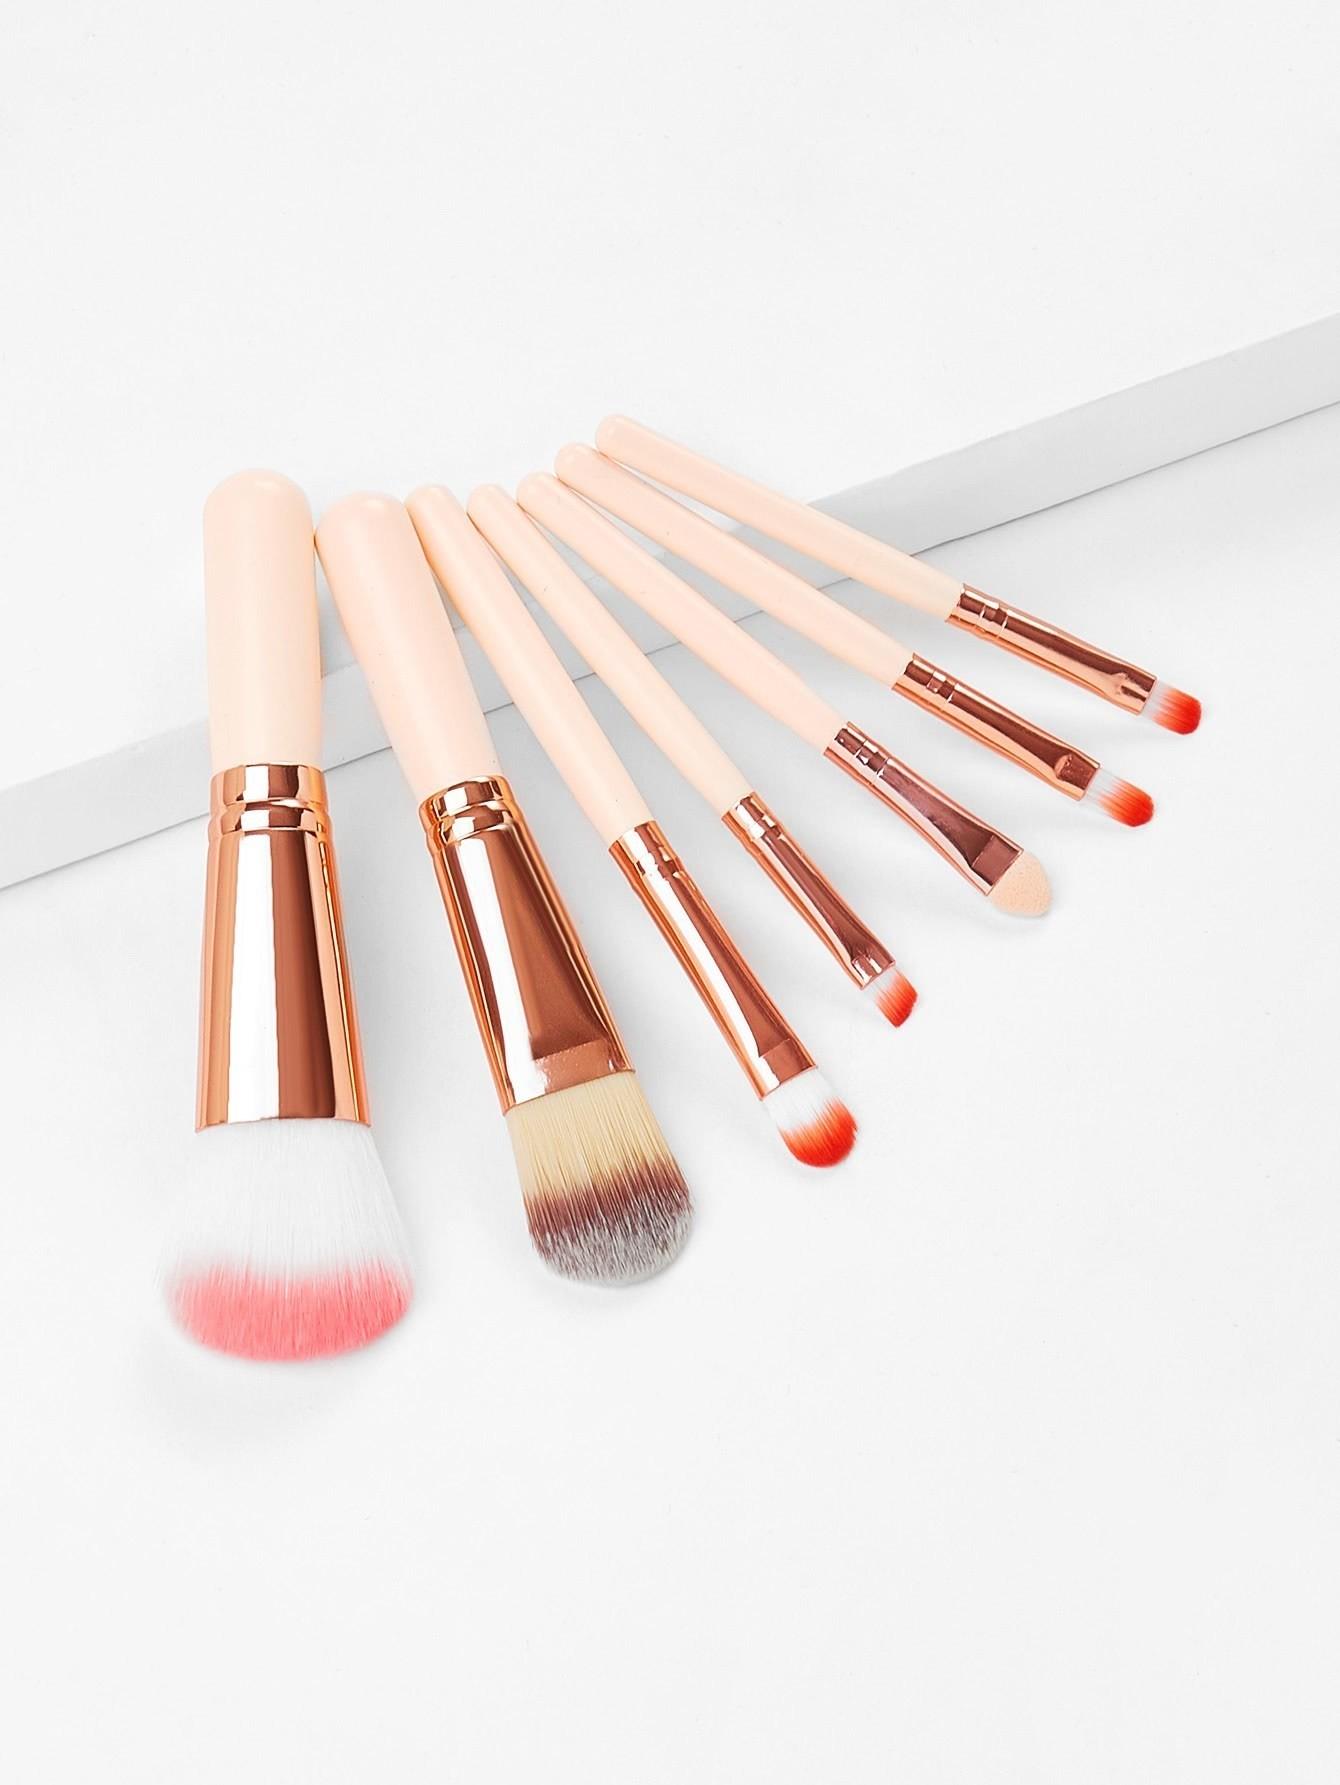 Wood Handle Professional Makeup Brush 7pcs